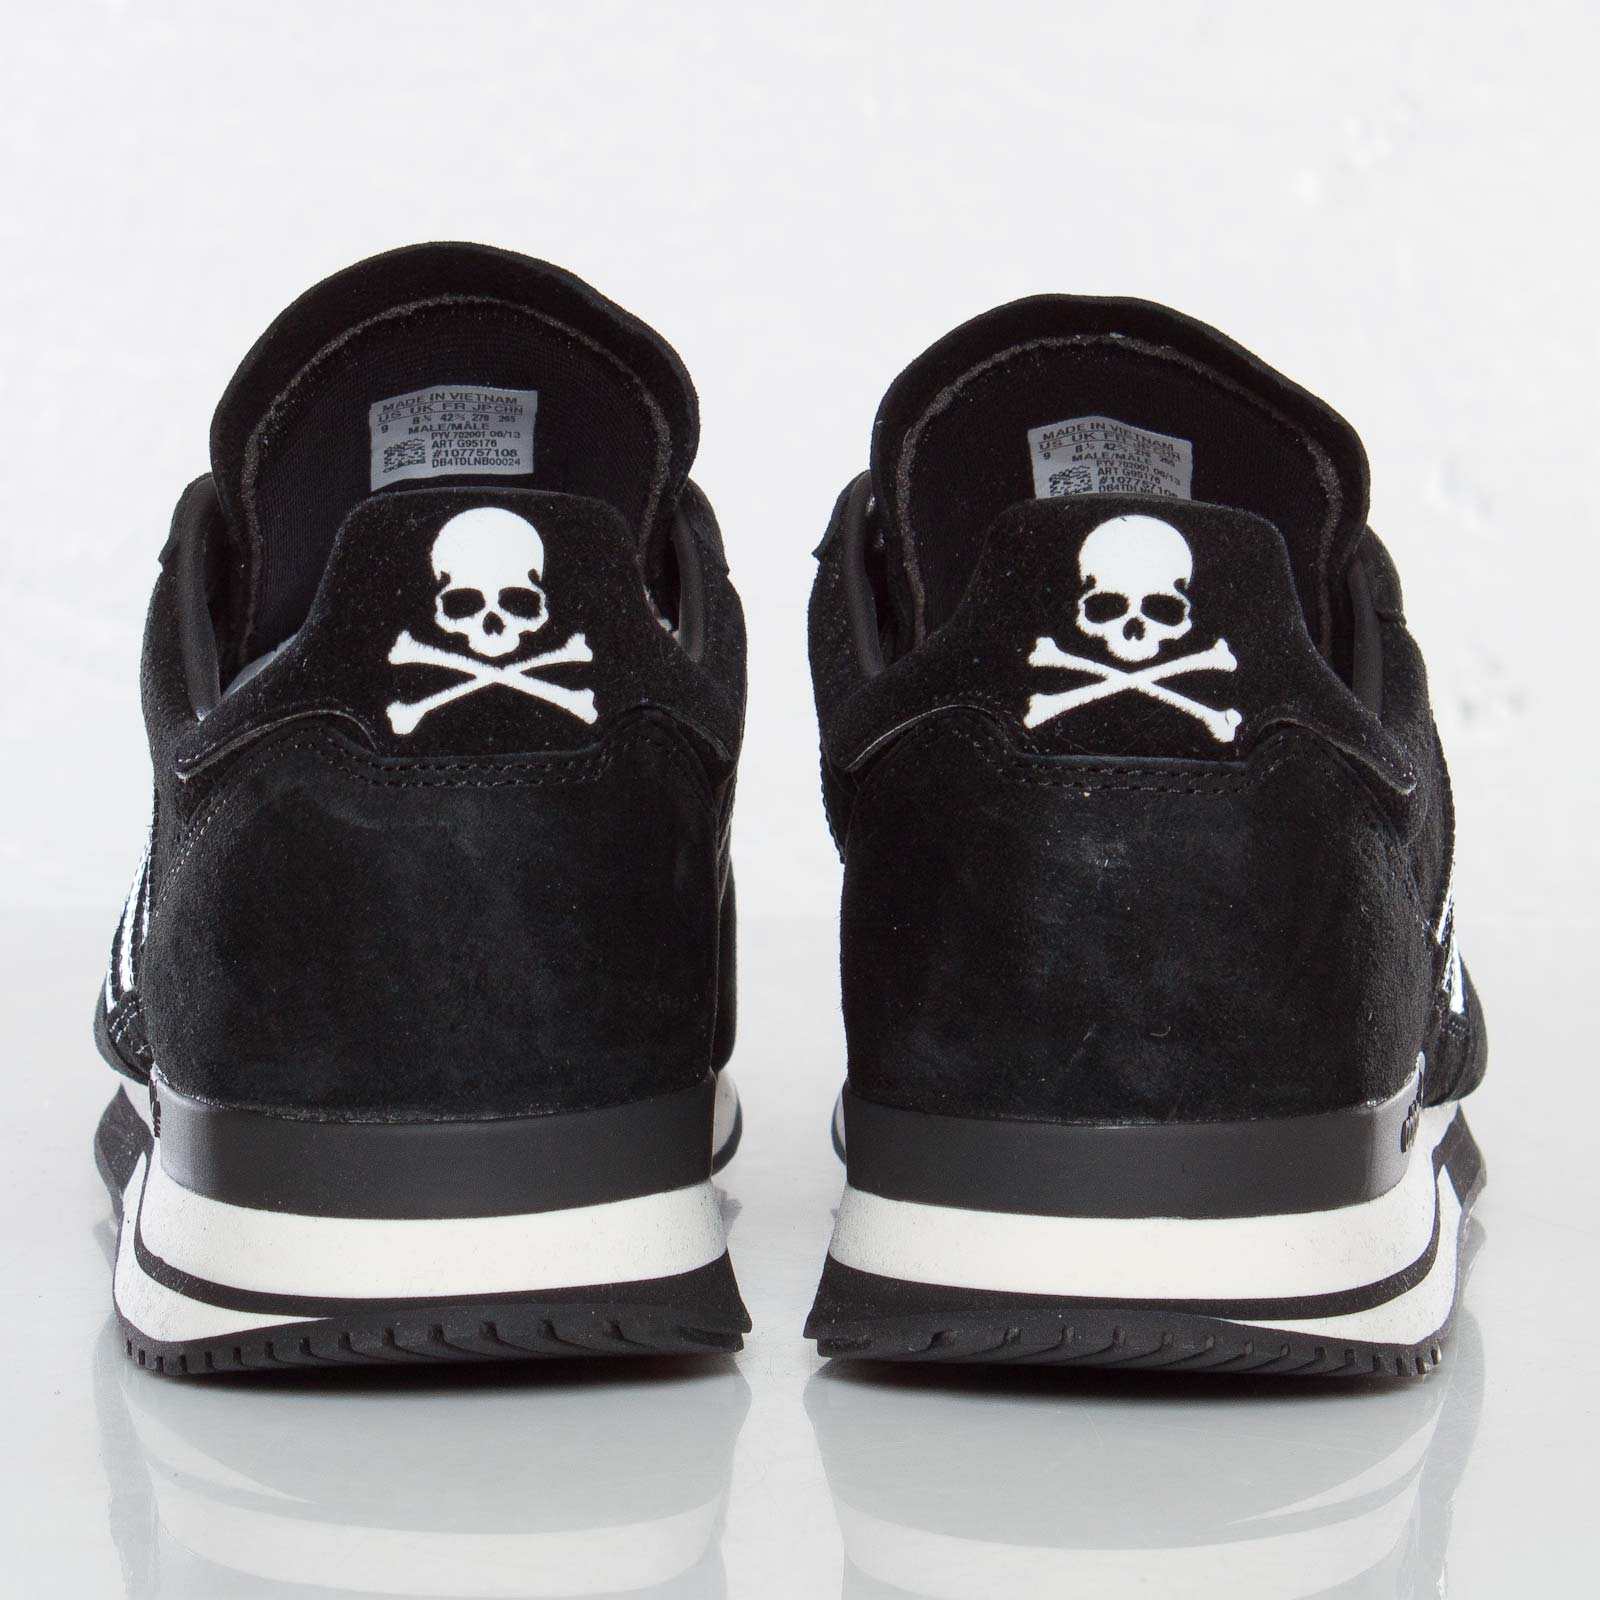 Parpadeo Innecesario una vez  adidas ZX 500 - mastermind - G95176 - Sneakersnstuff   sneakers &  streetwear online since 1999